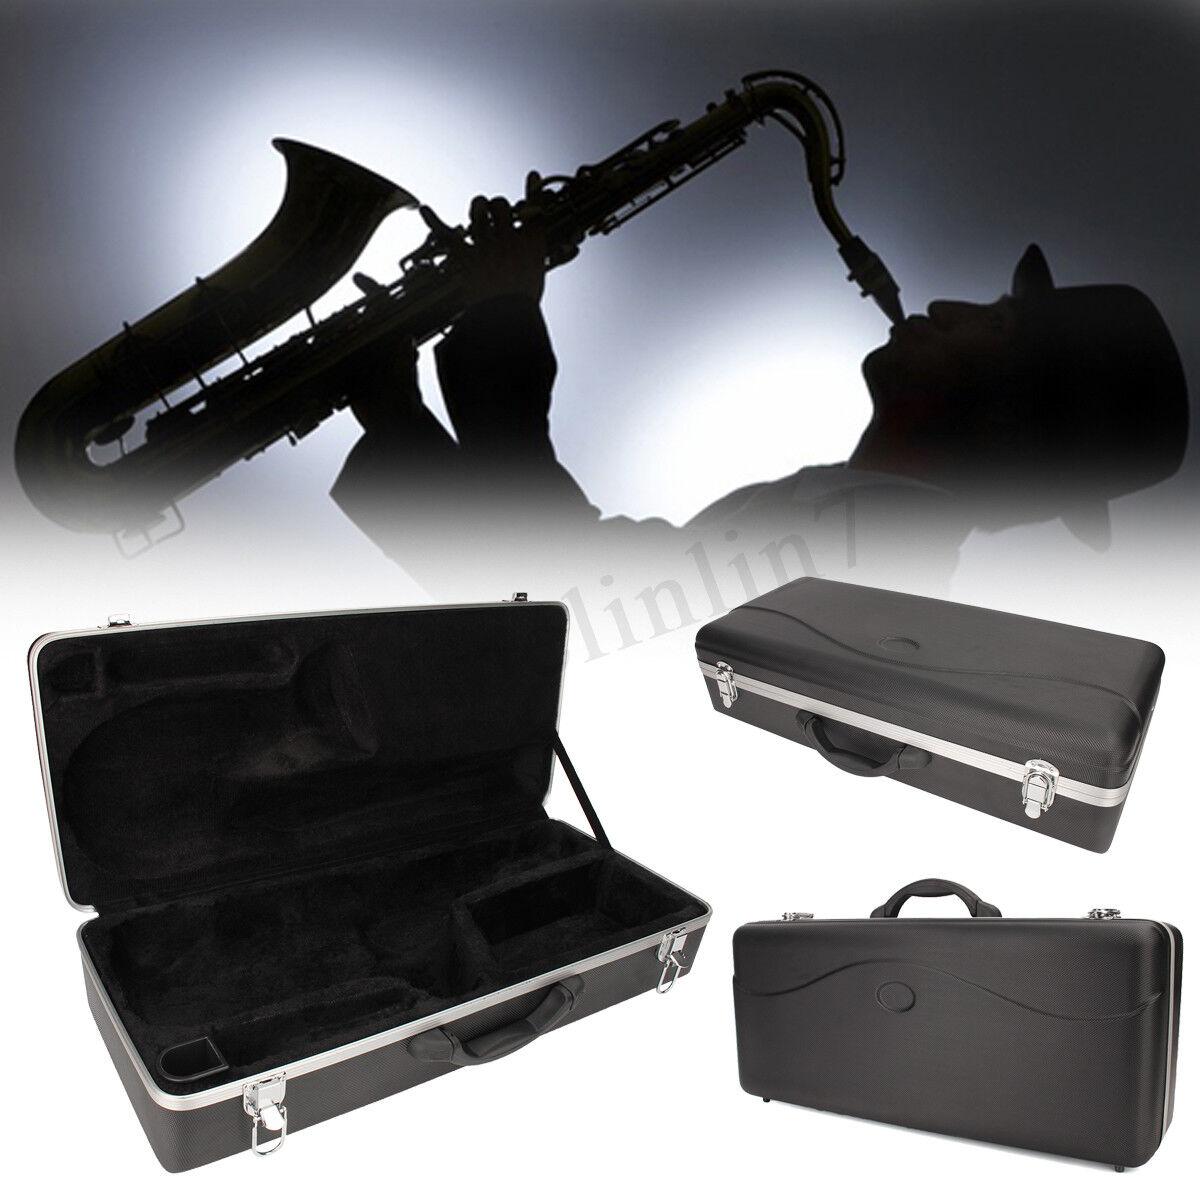 Professional Alto Saxophone Hardshell Case Sax Bag Box Instrument Predection UK